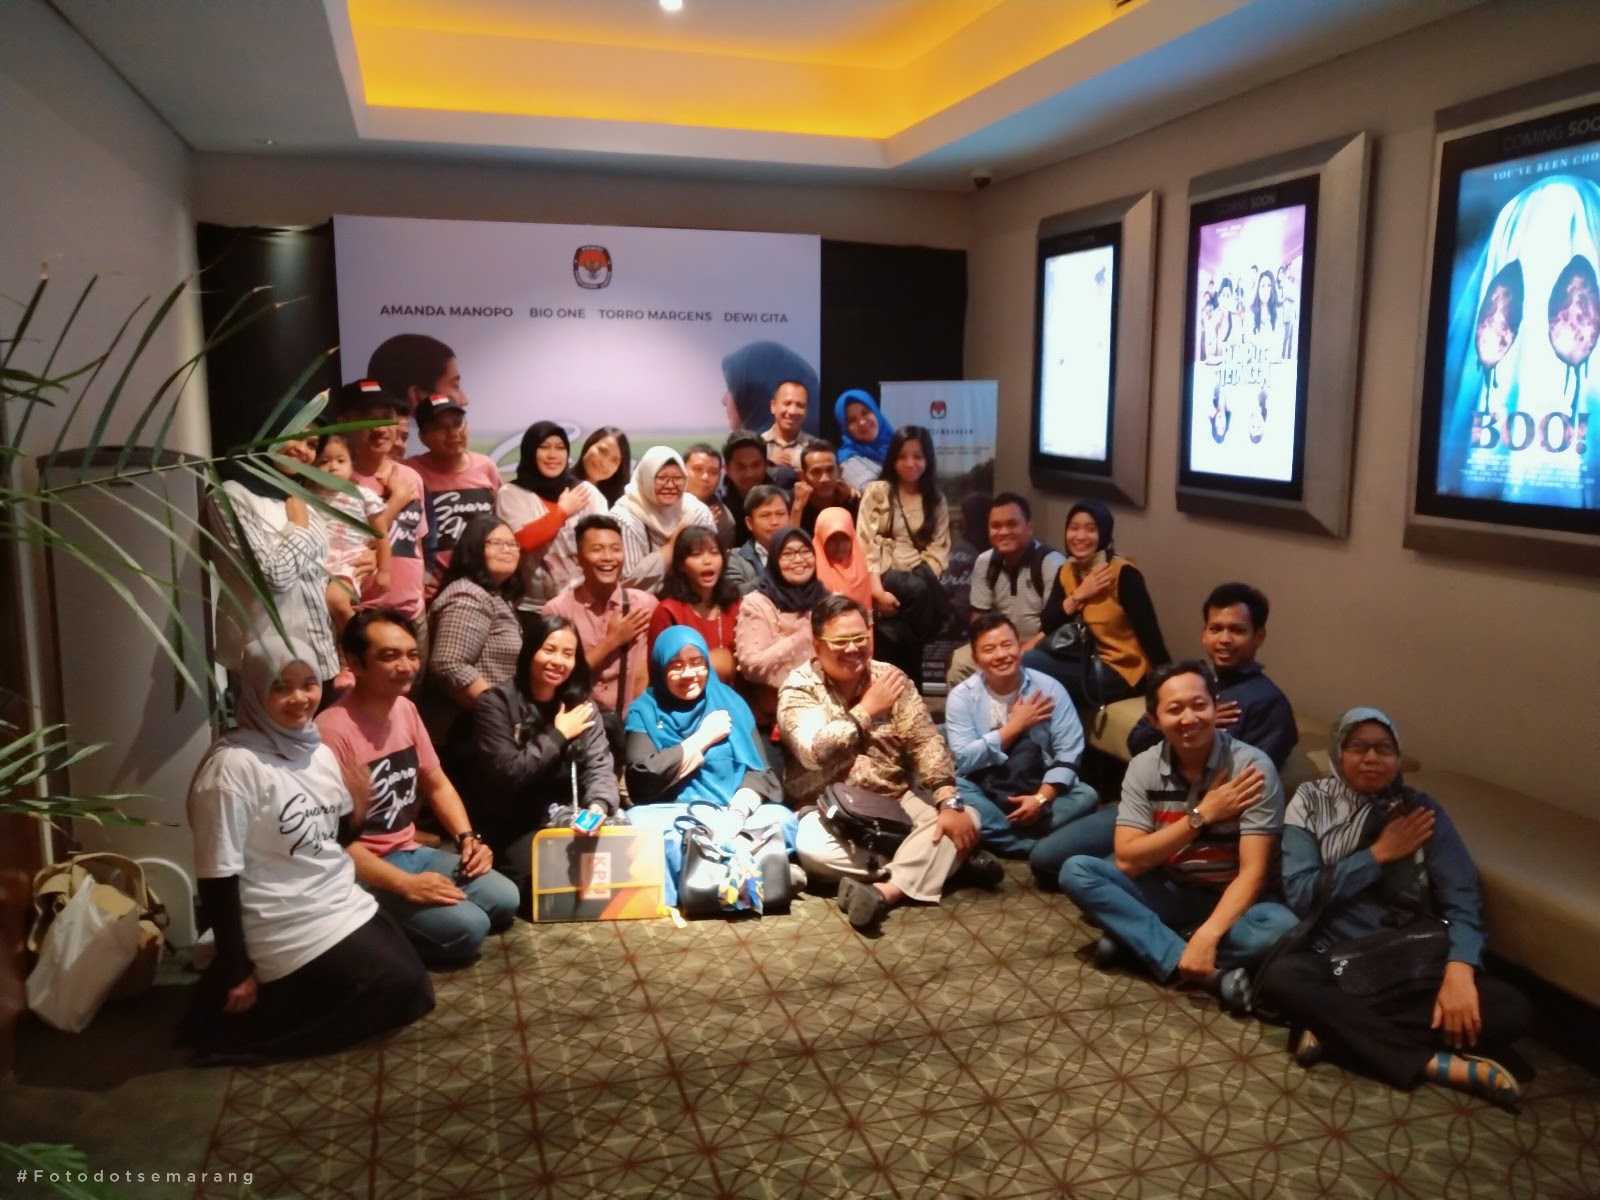 Edukasi Pemilu Lewat Film Suara April, KPU Jateng Ajak Nonton Bareng